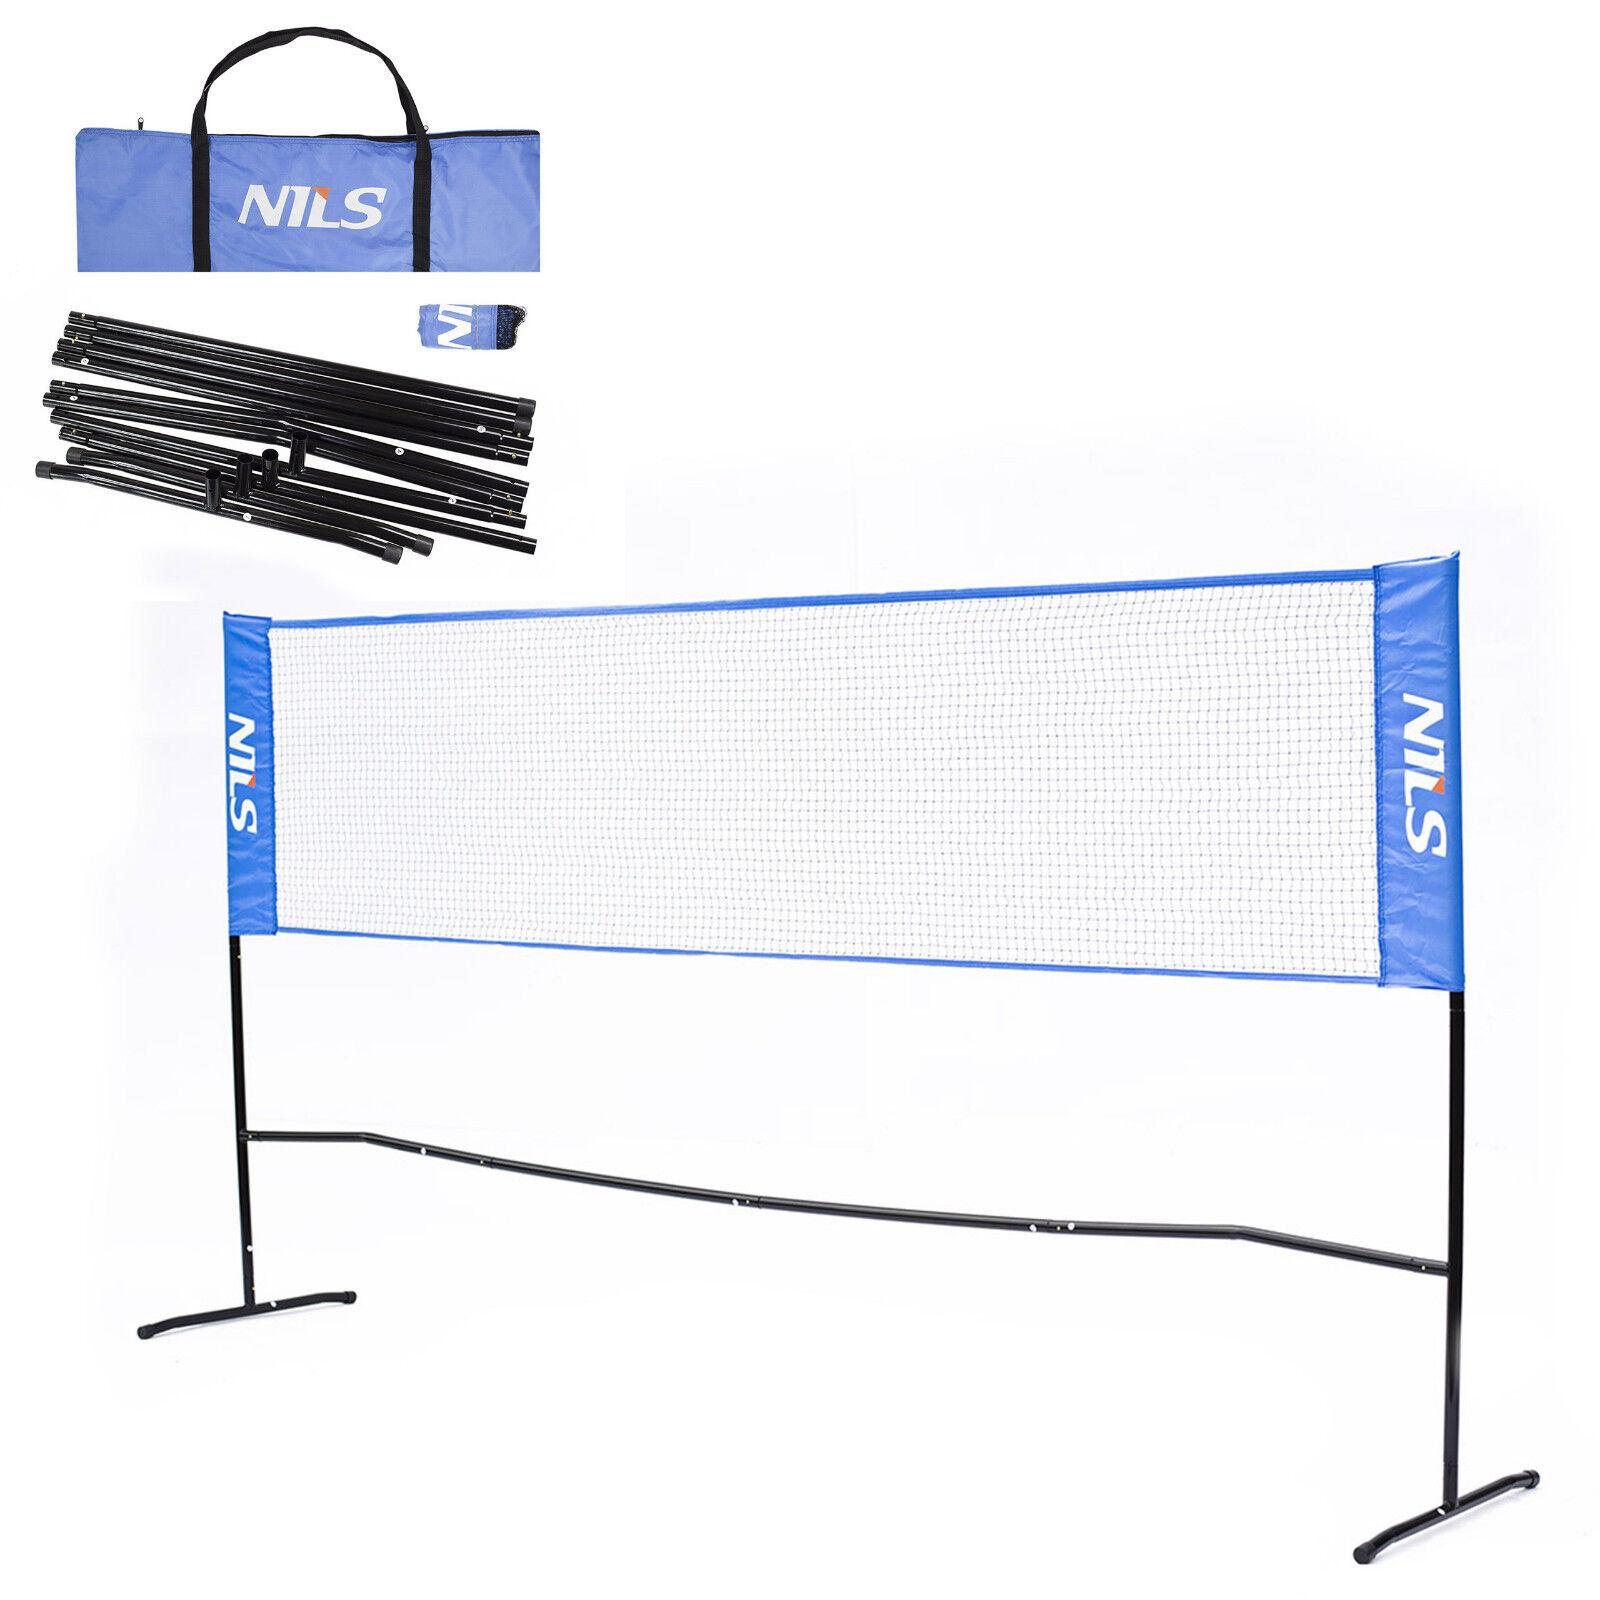 Badmintonnetz Federballnetz Tennisnetz Volleyballnetz Badminton Netz 3 M Tasche